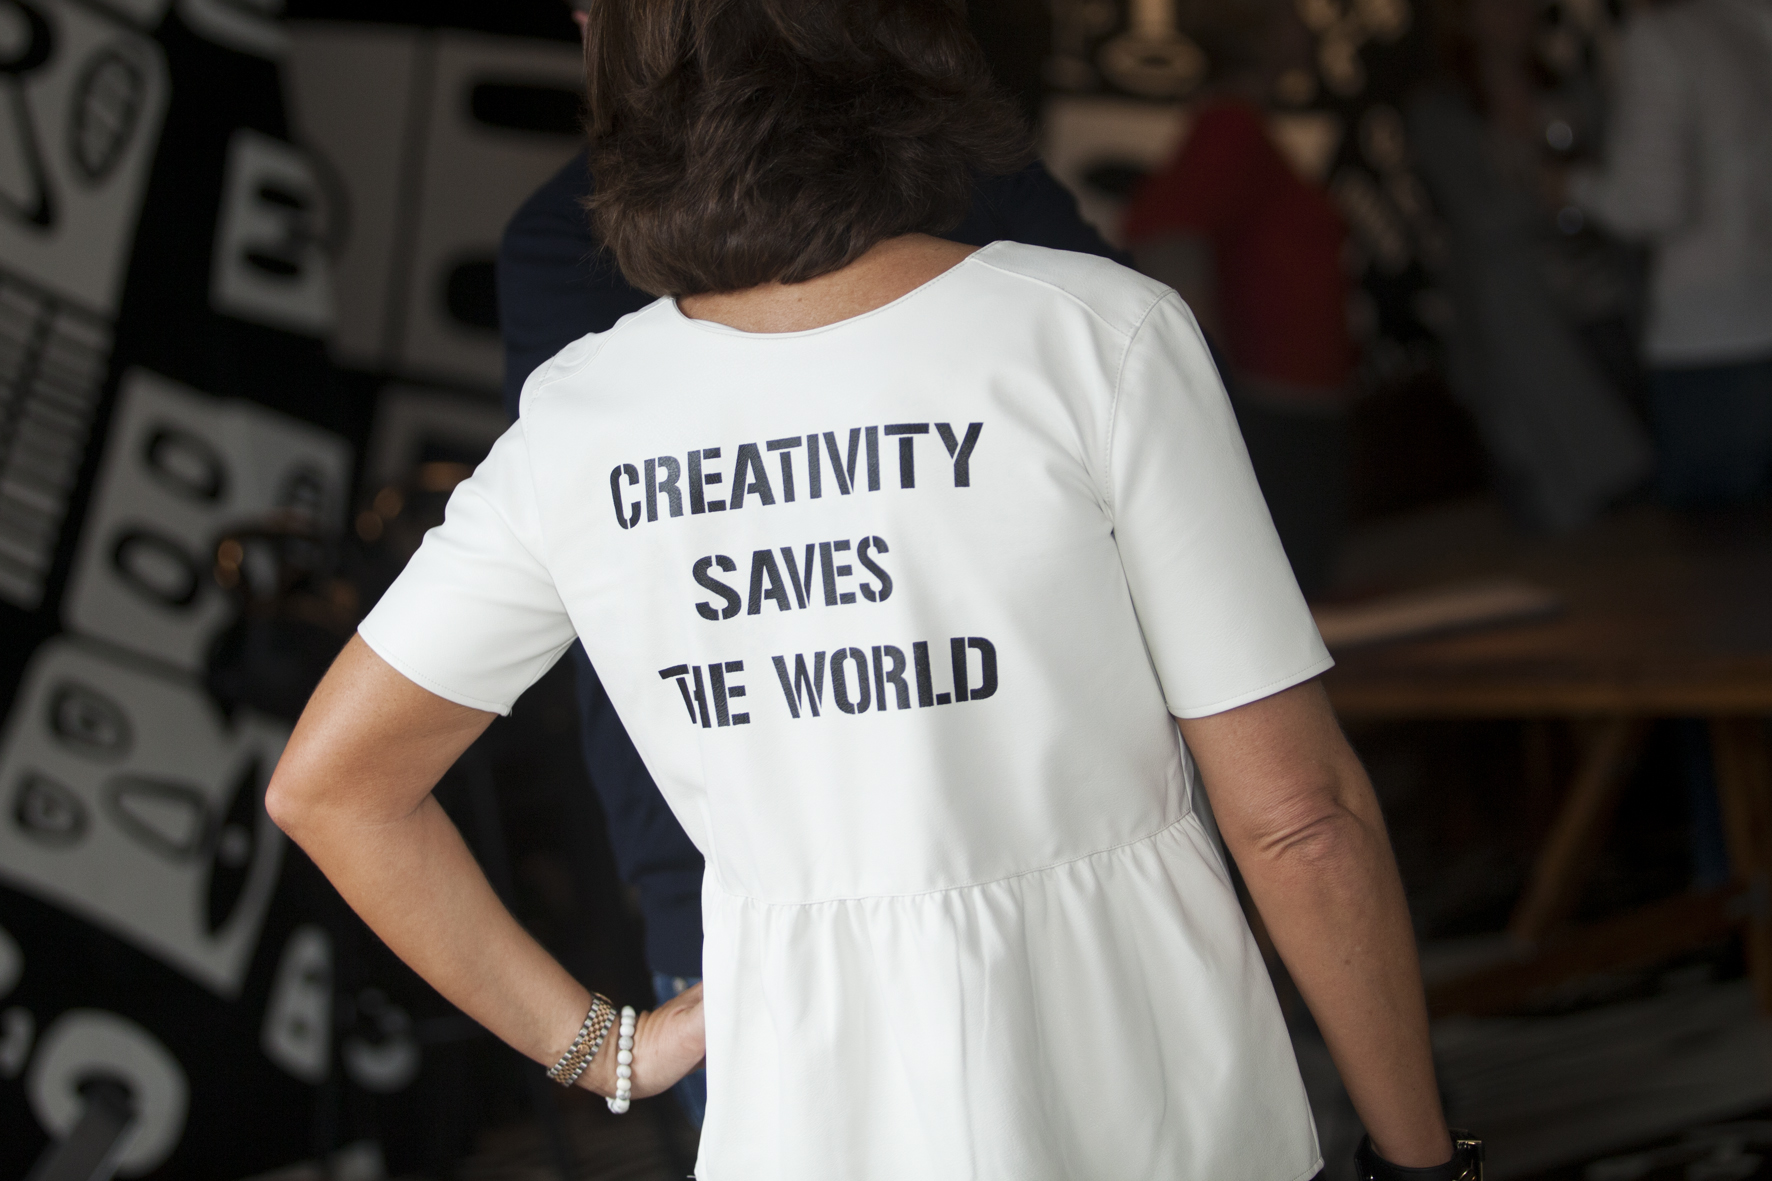 CreativitySavestheworld.jpg